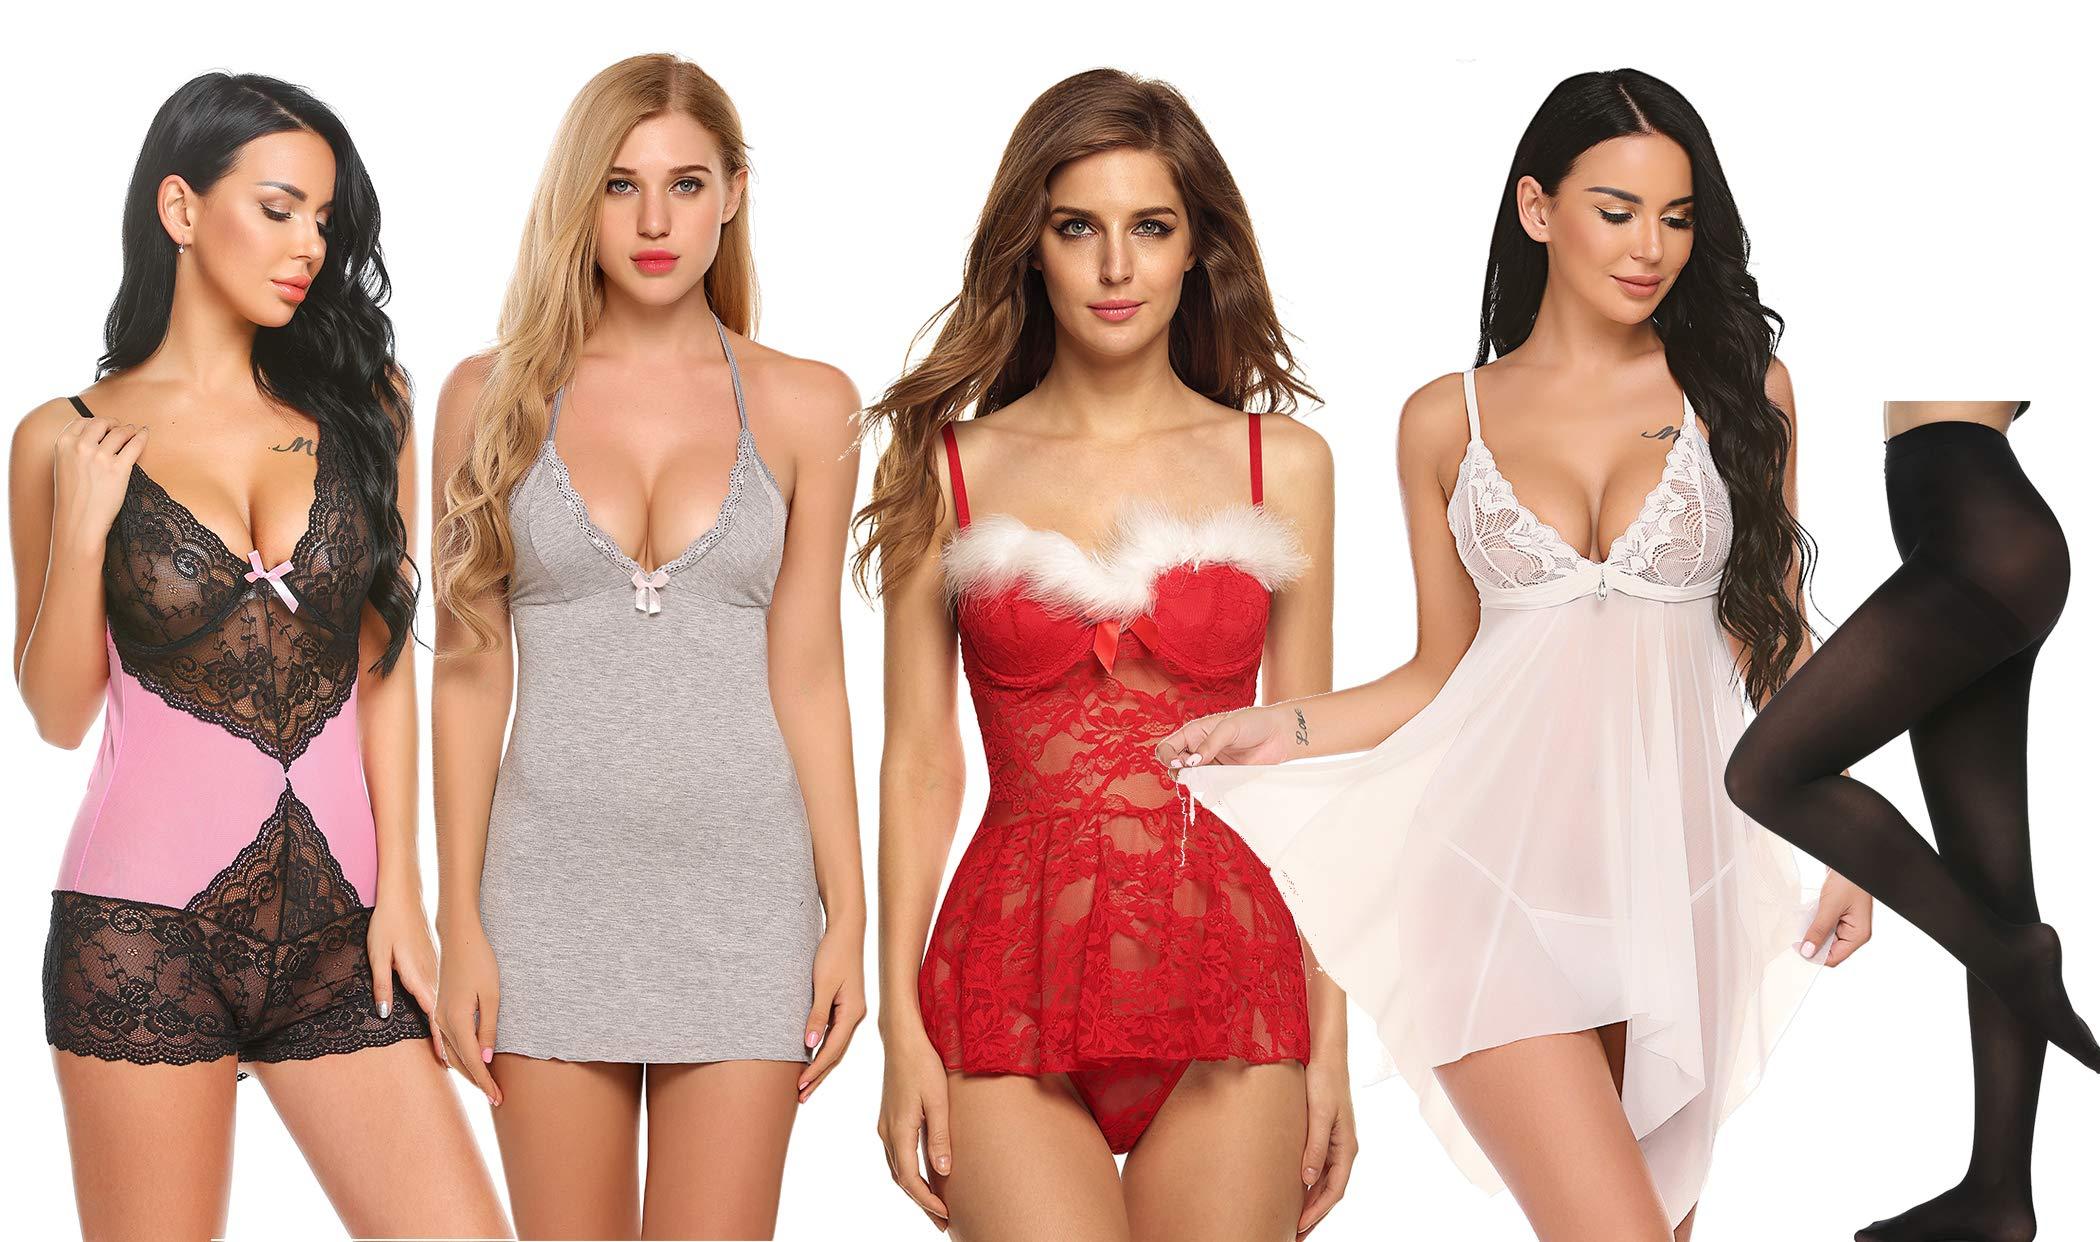 ELOVER Women Sexy Lingerie Lace Babydoll Nightgown Mini Teddy 5 Pack Sleepwear